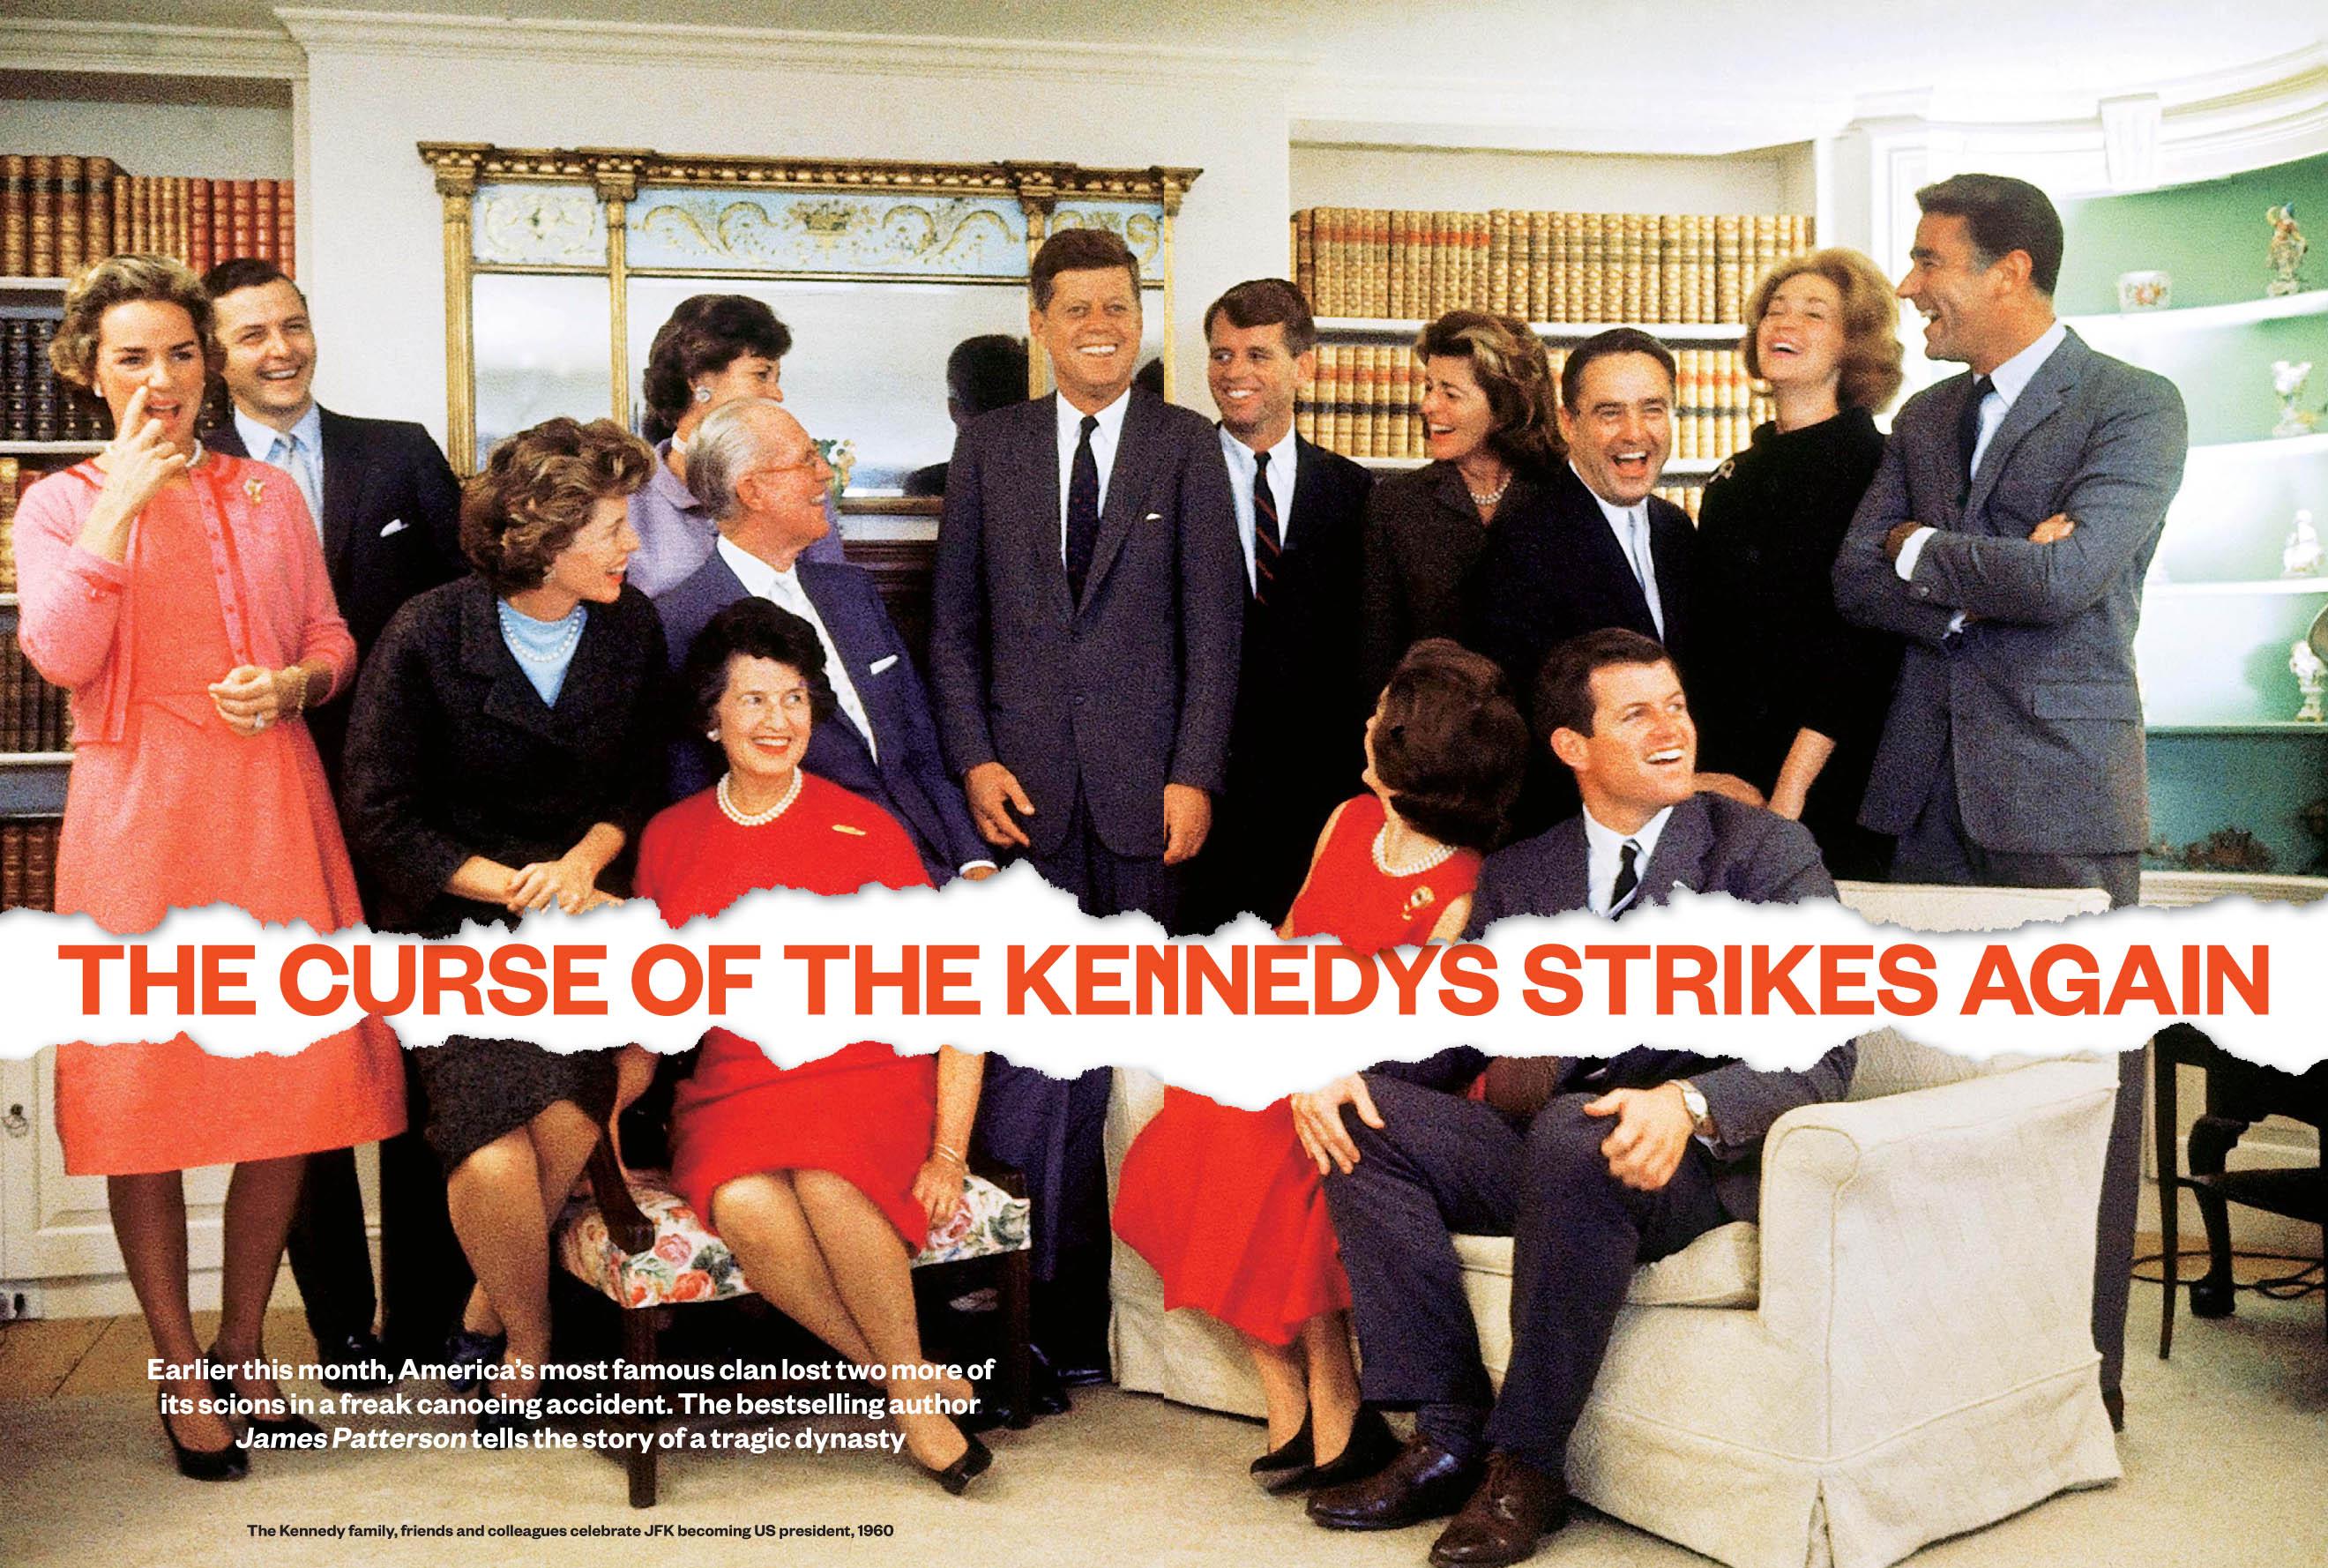 Sunday Times Magazine 200419 Kennedys-2.jpg